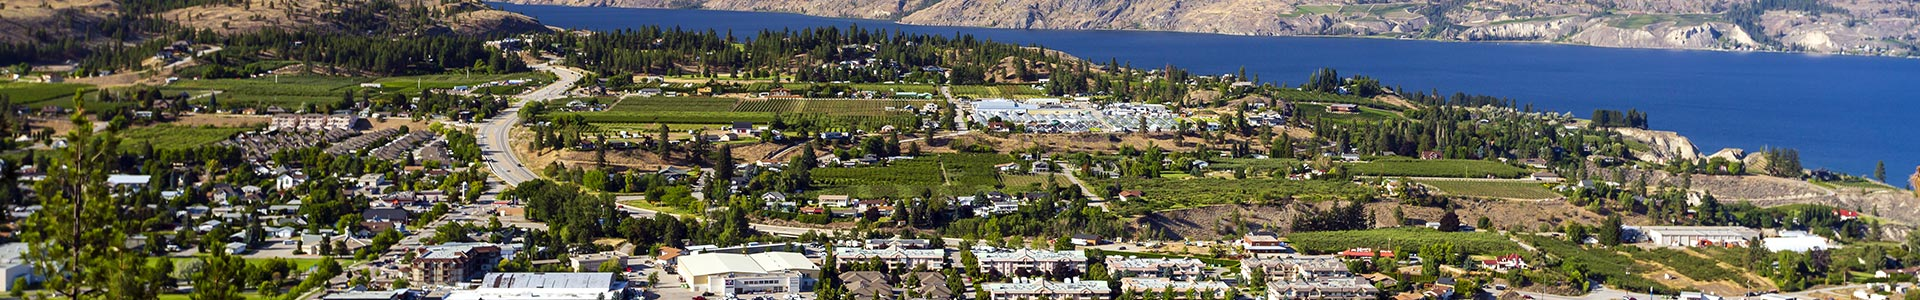 Summerland Okanagan Lake